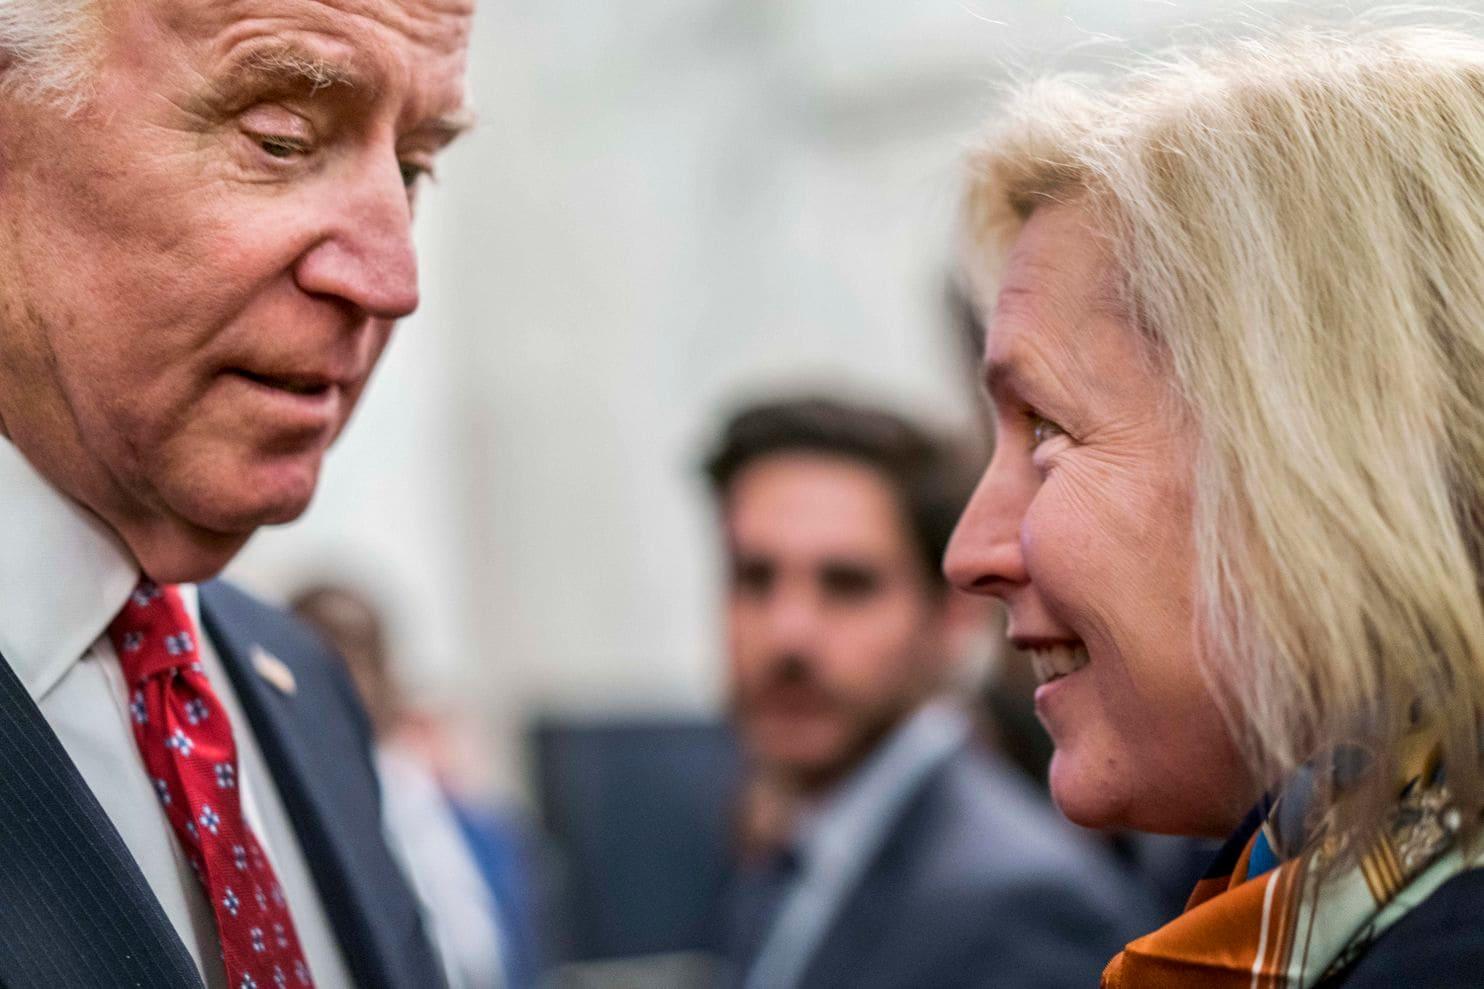 Photo from Washington Post